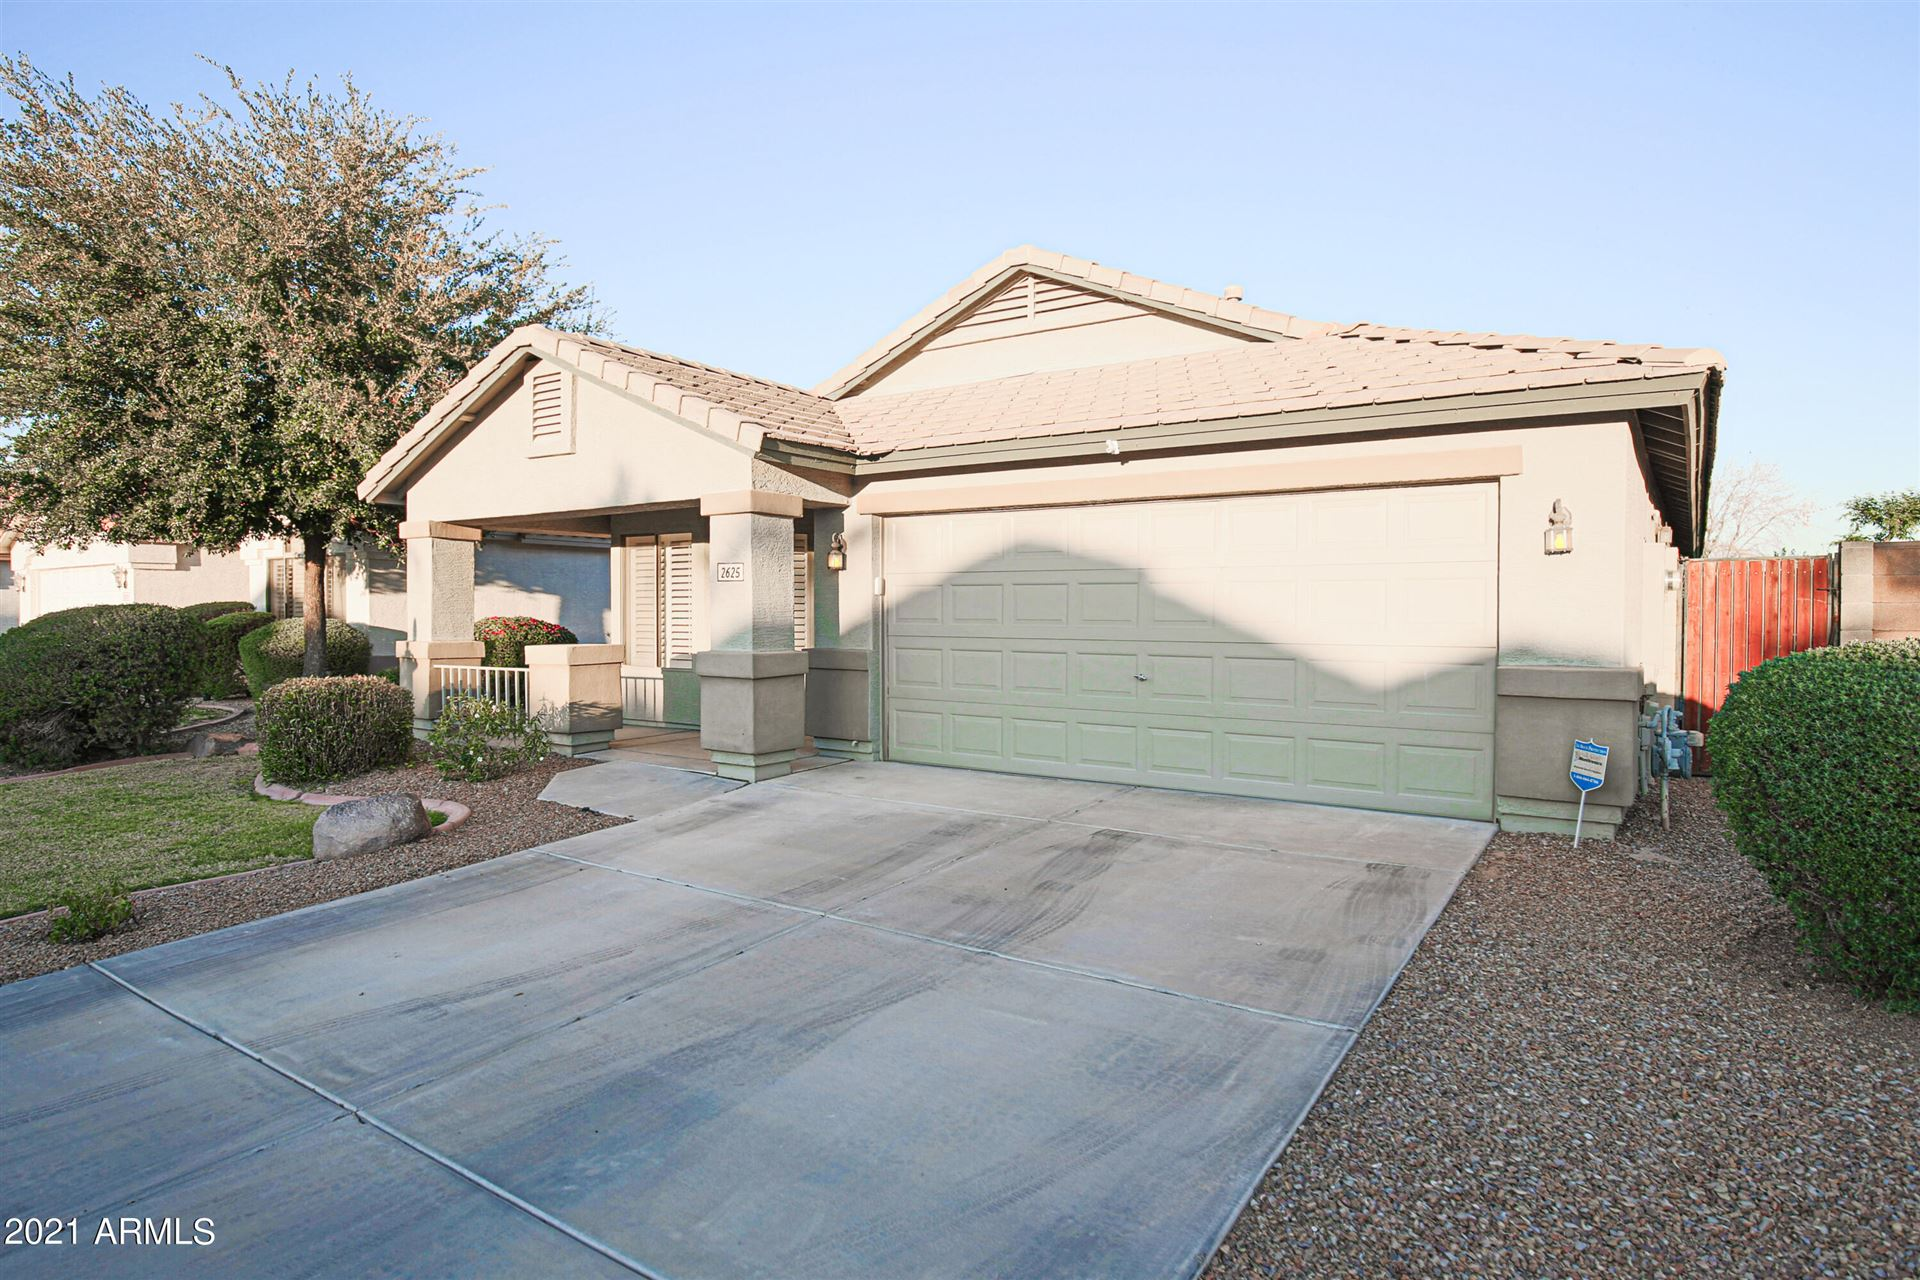 Photo of 2625 N 109TH Avenue, Avondale, AZ 85392 (MLS # 6197878)